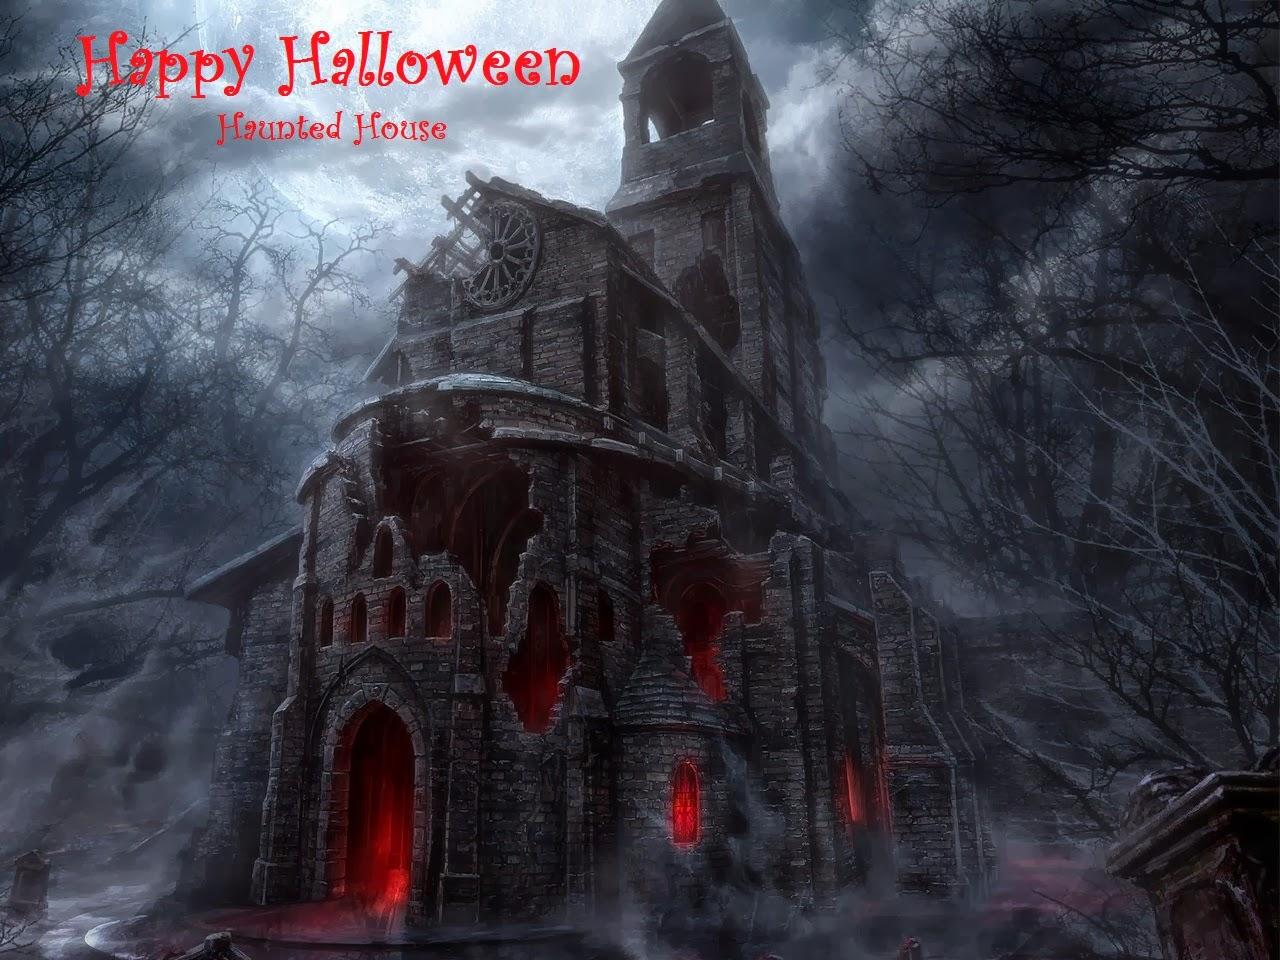 Halloween Haunted House Live Photo Gallery   Festival Chaska 1280x960